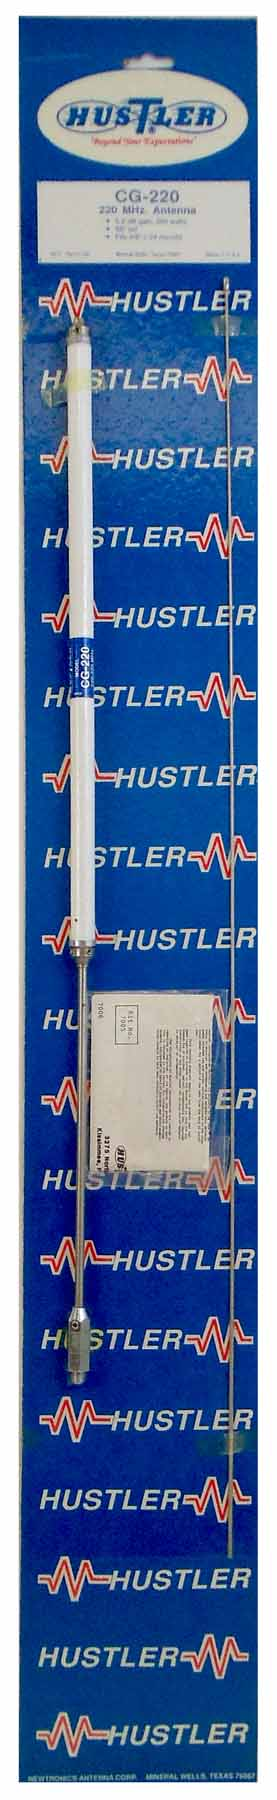 Mine the dcl hustler antenna